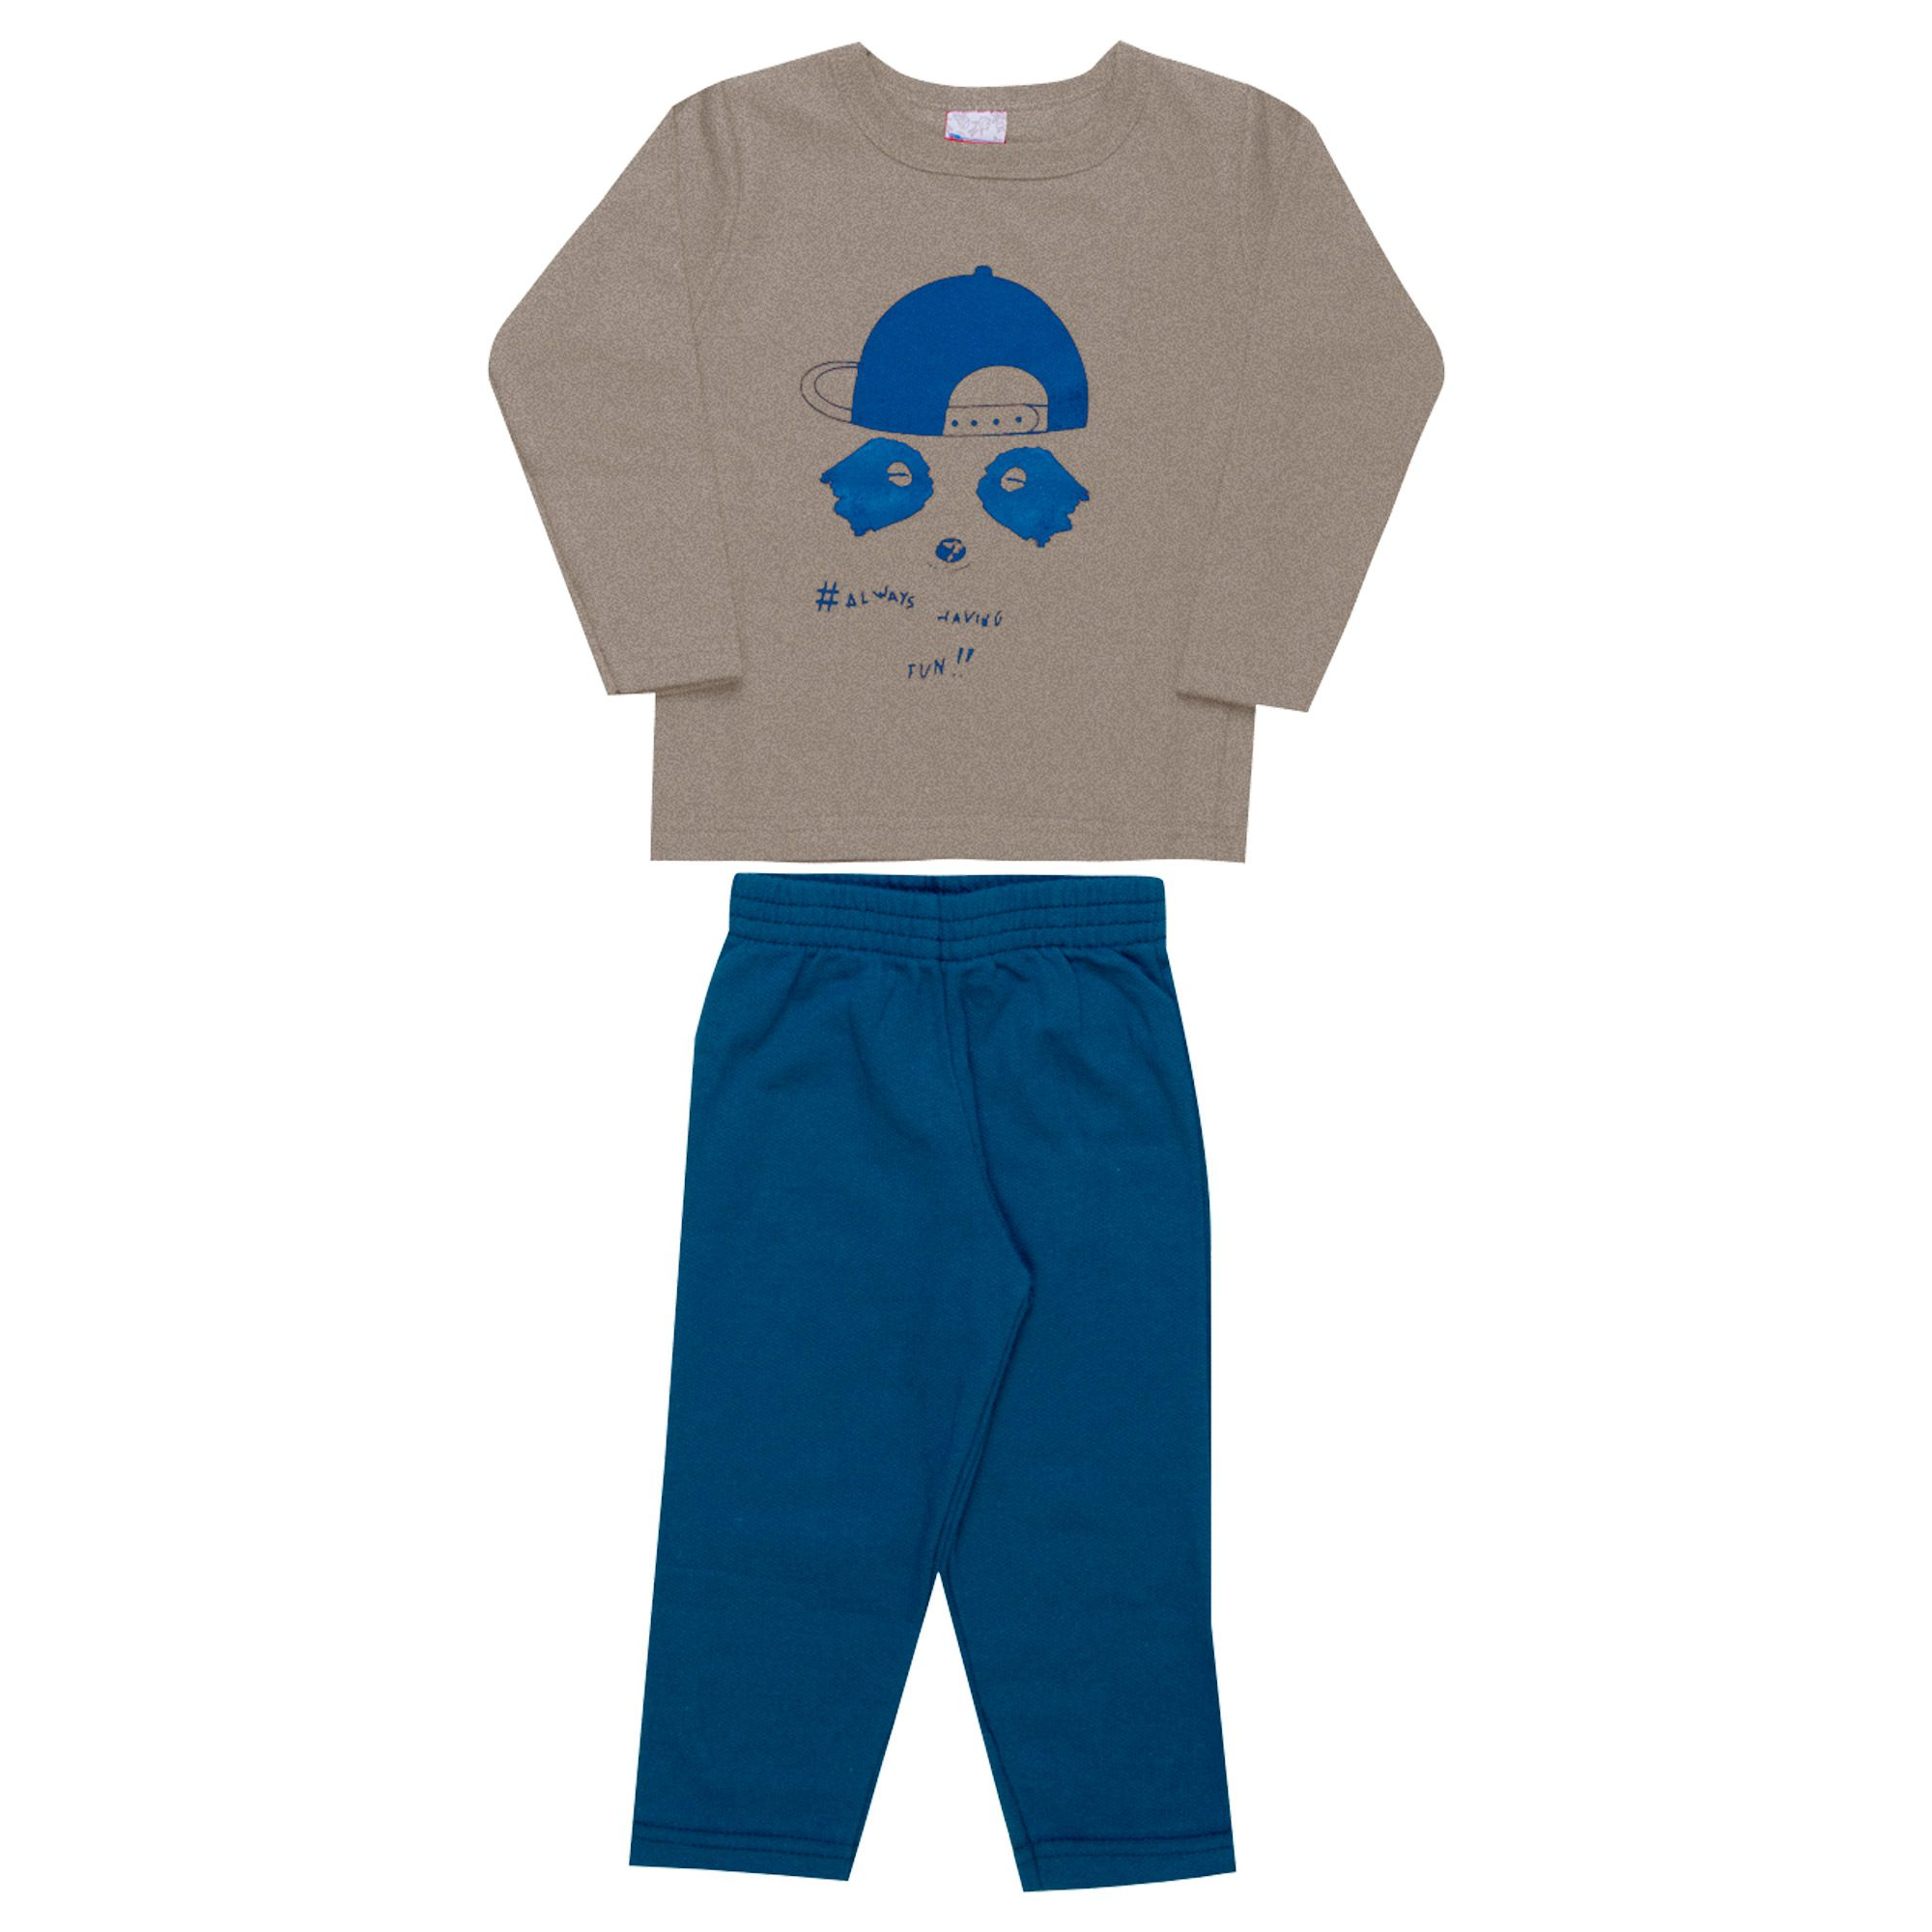 Conjunto Infantil Masculino  2 peças - Ref 1959 - Banana/Azul